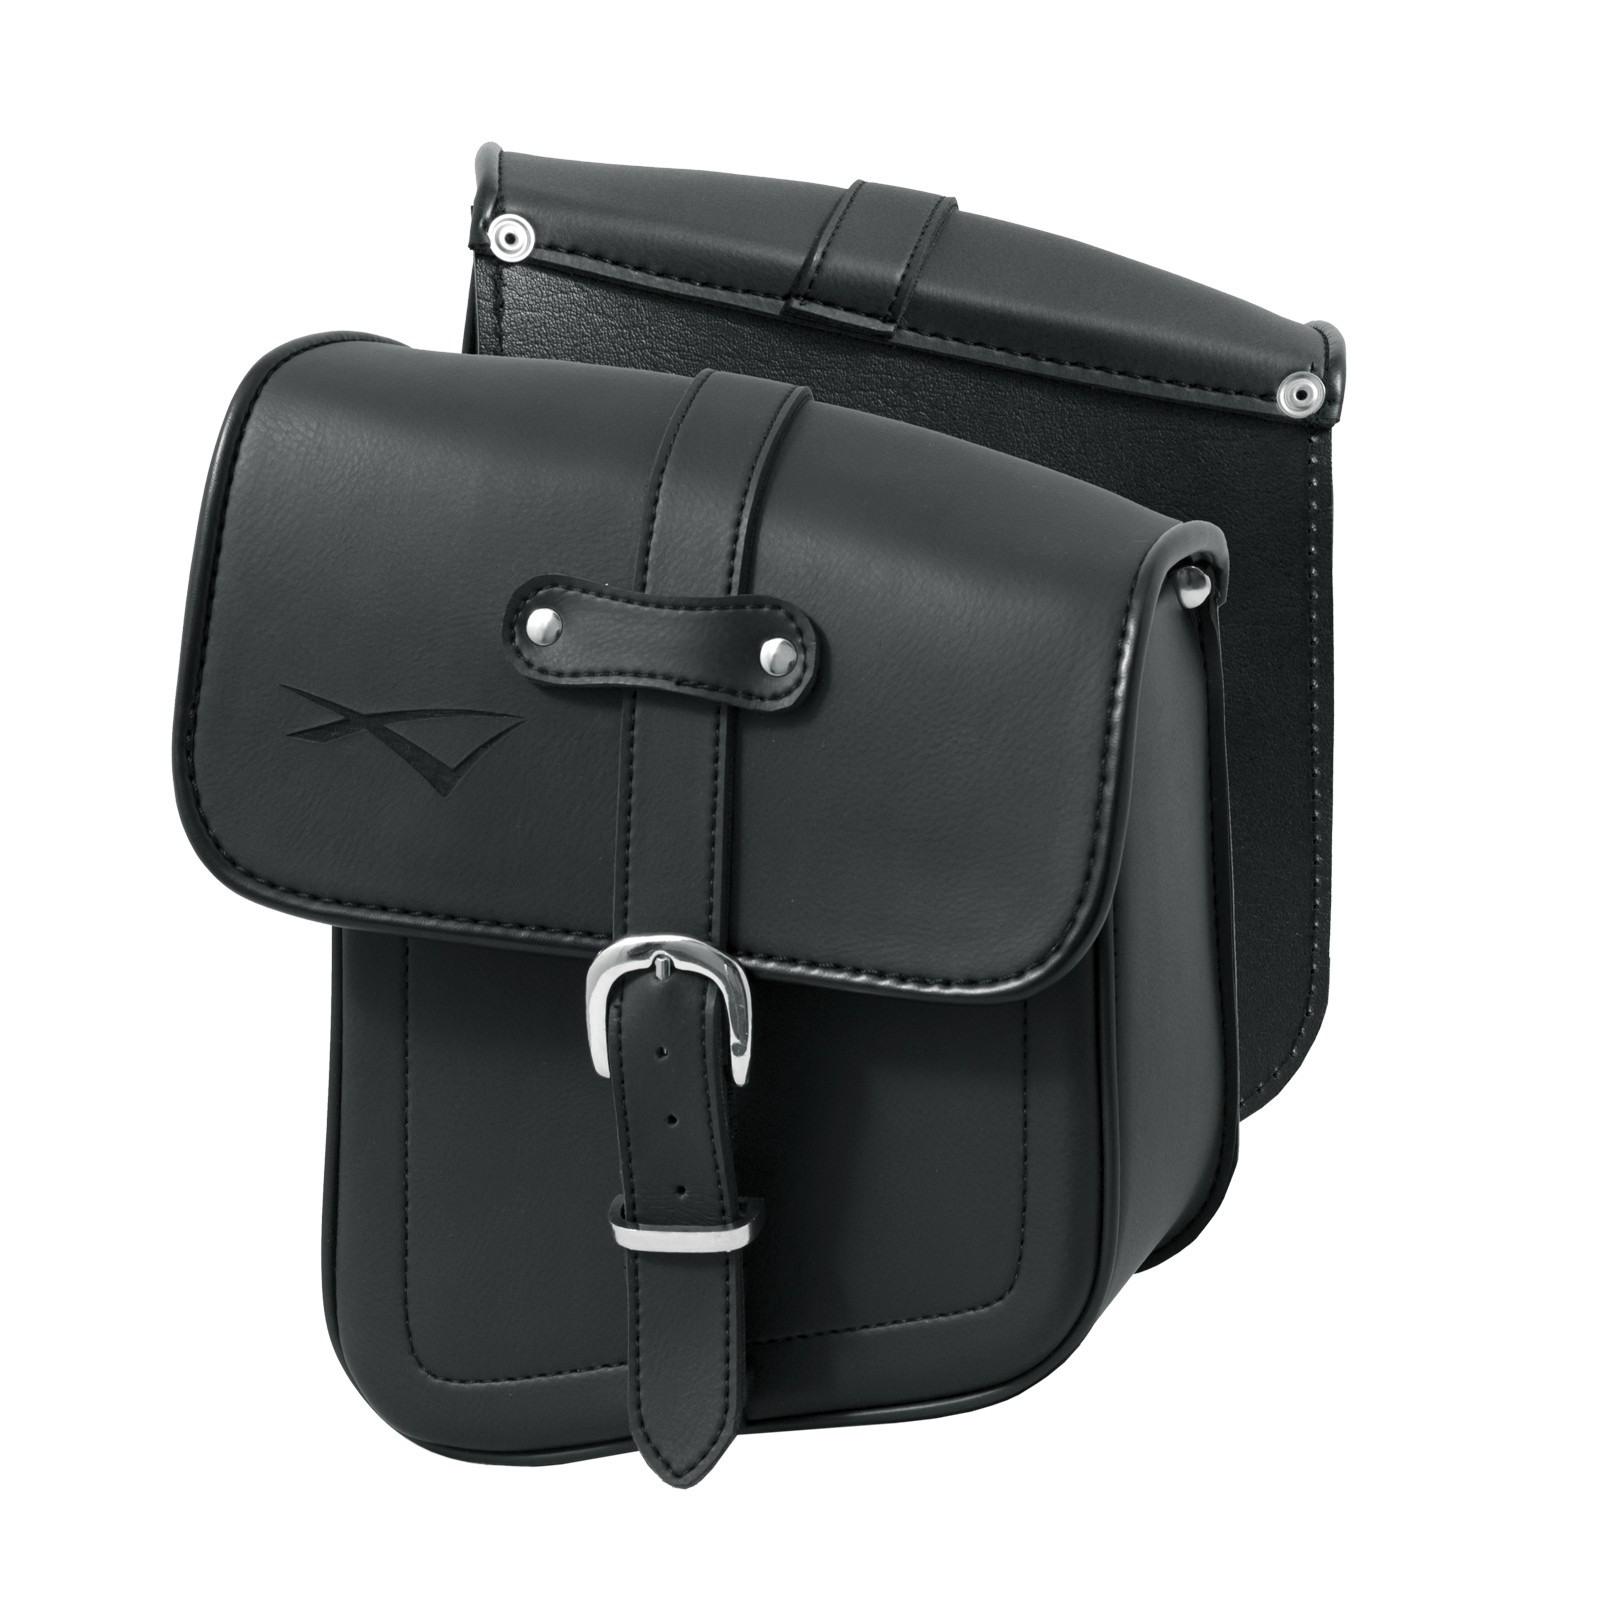 Sport-A-Pro-Borsa-Bag-Nero-Black-Pelle-Leather-Sonic-Moto_Mono_DX